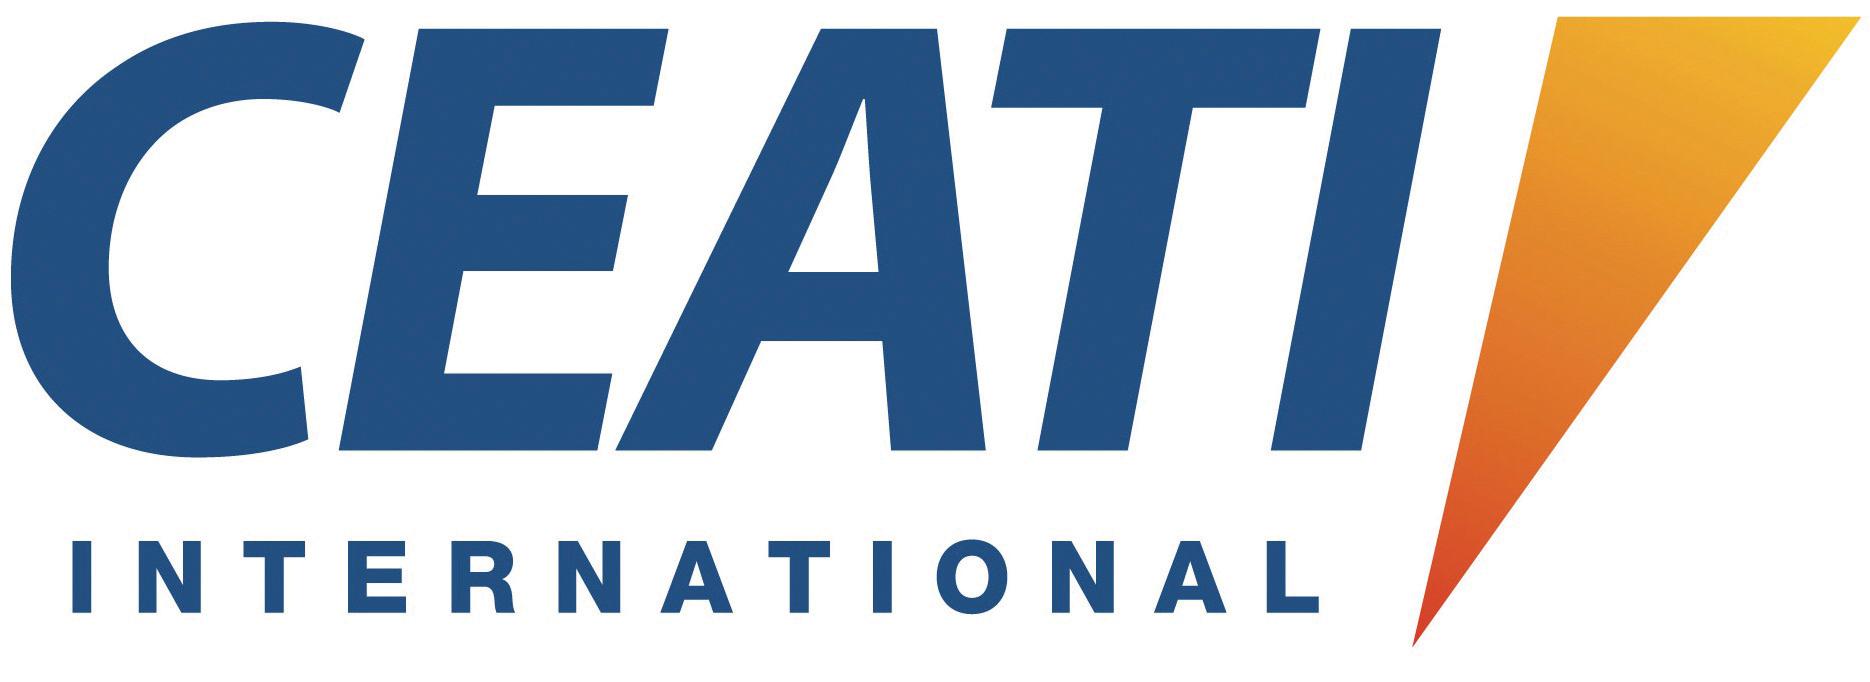 CEATI_International.jpg